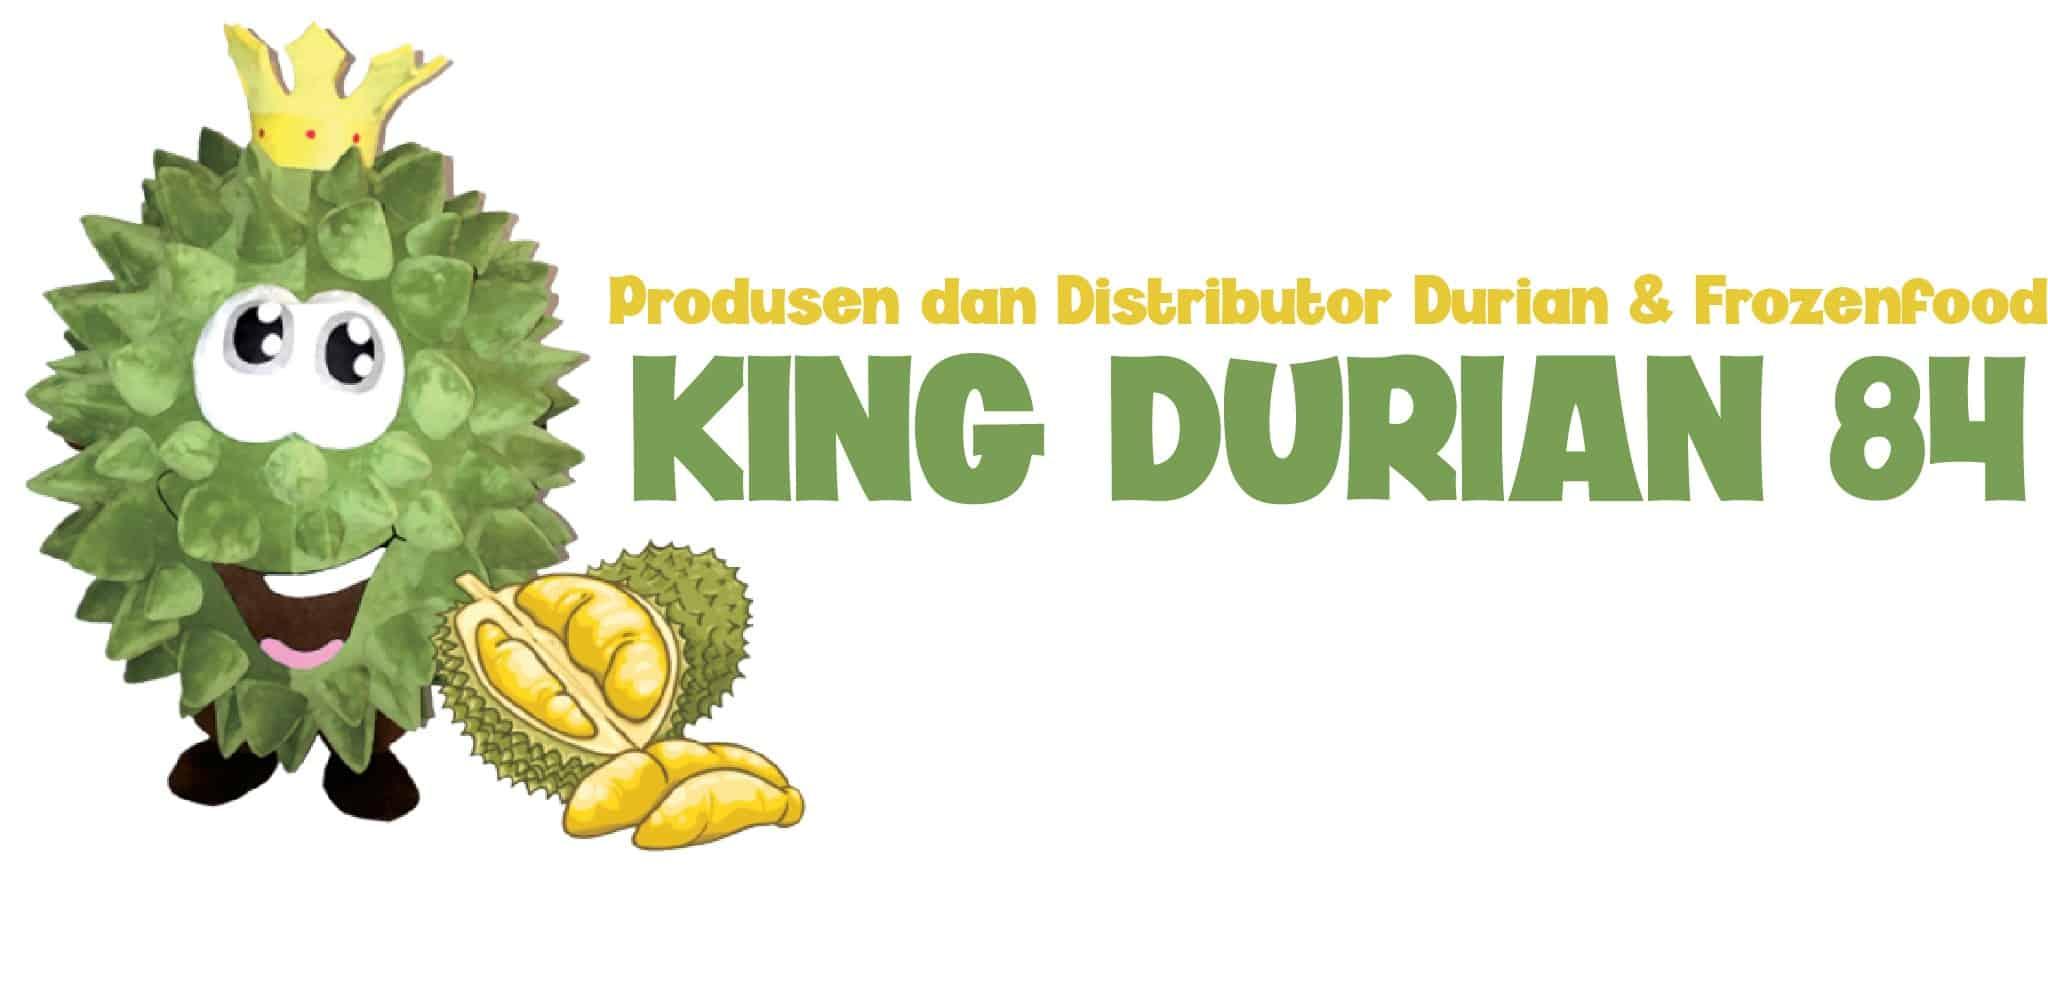 KingDurian84